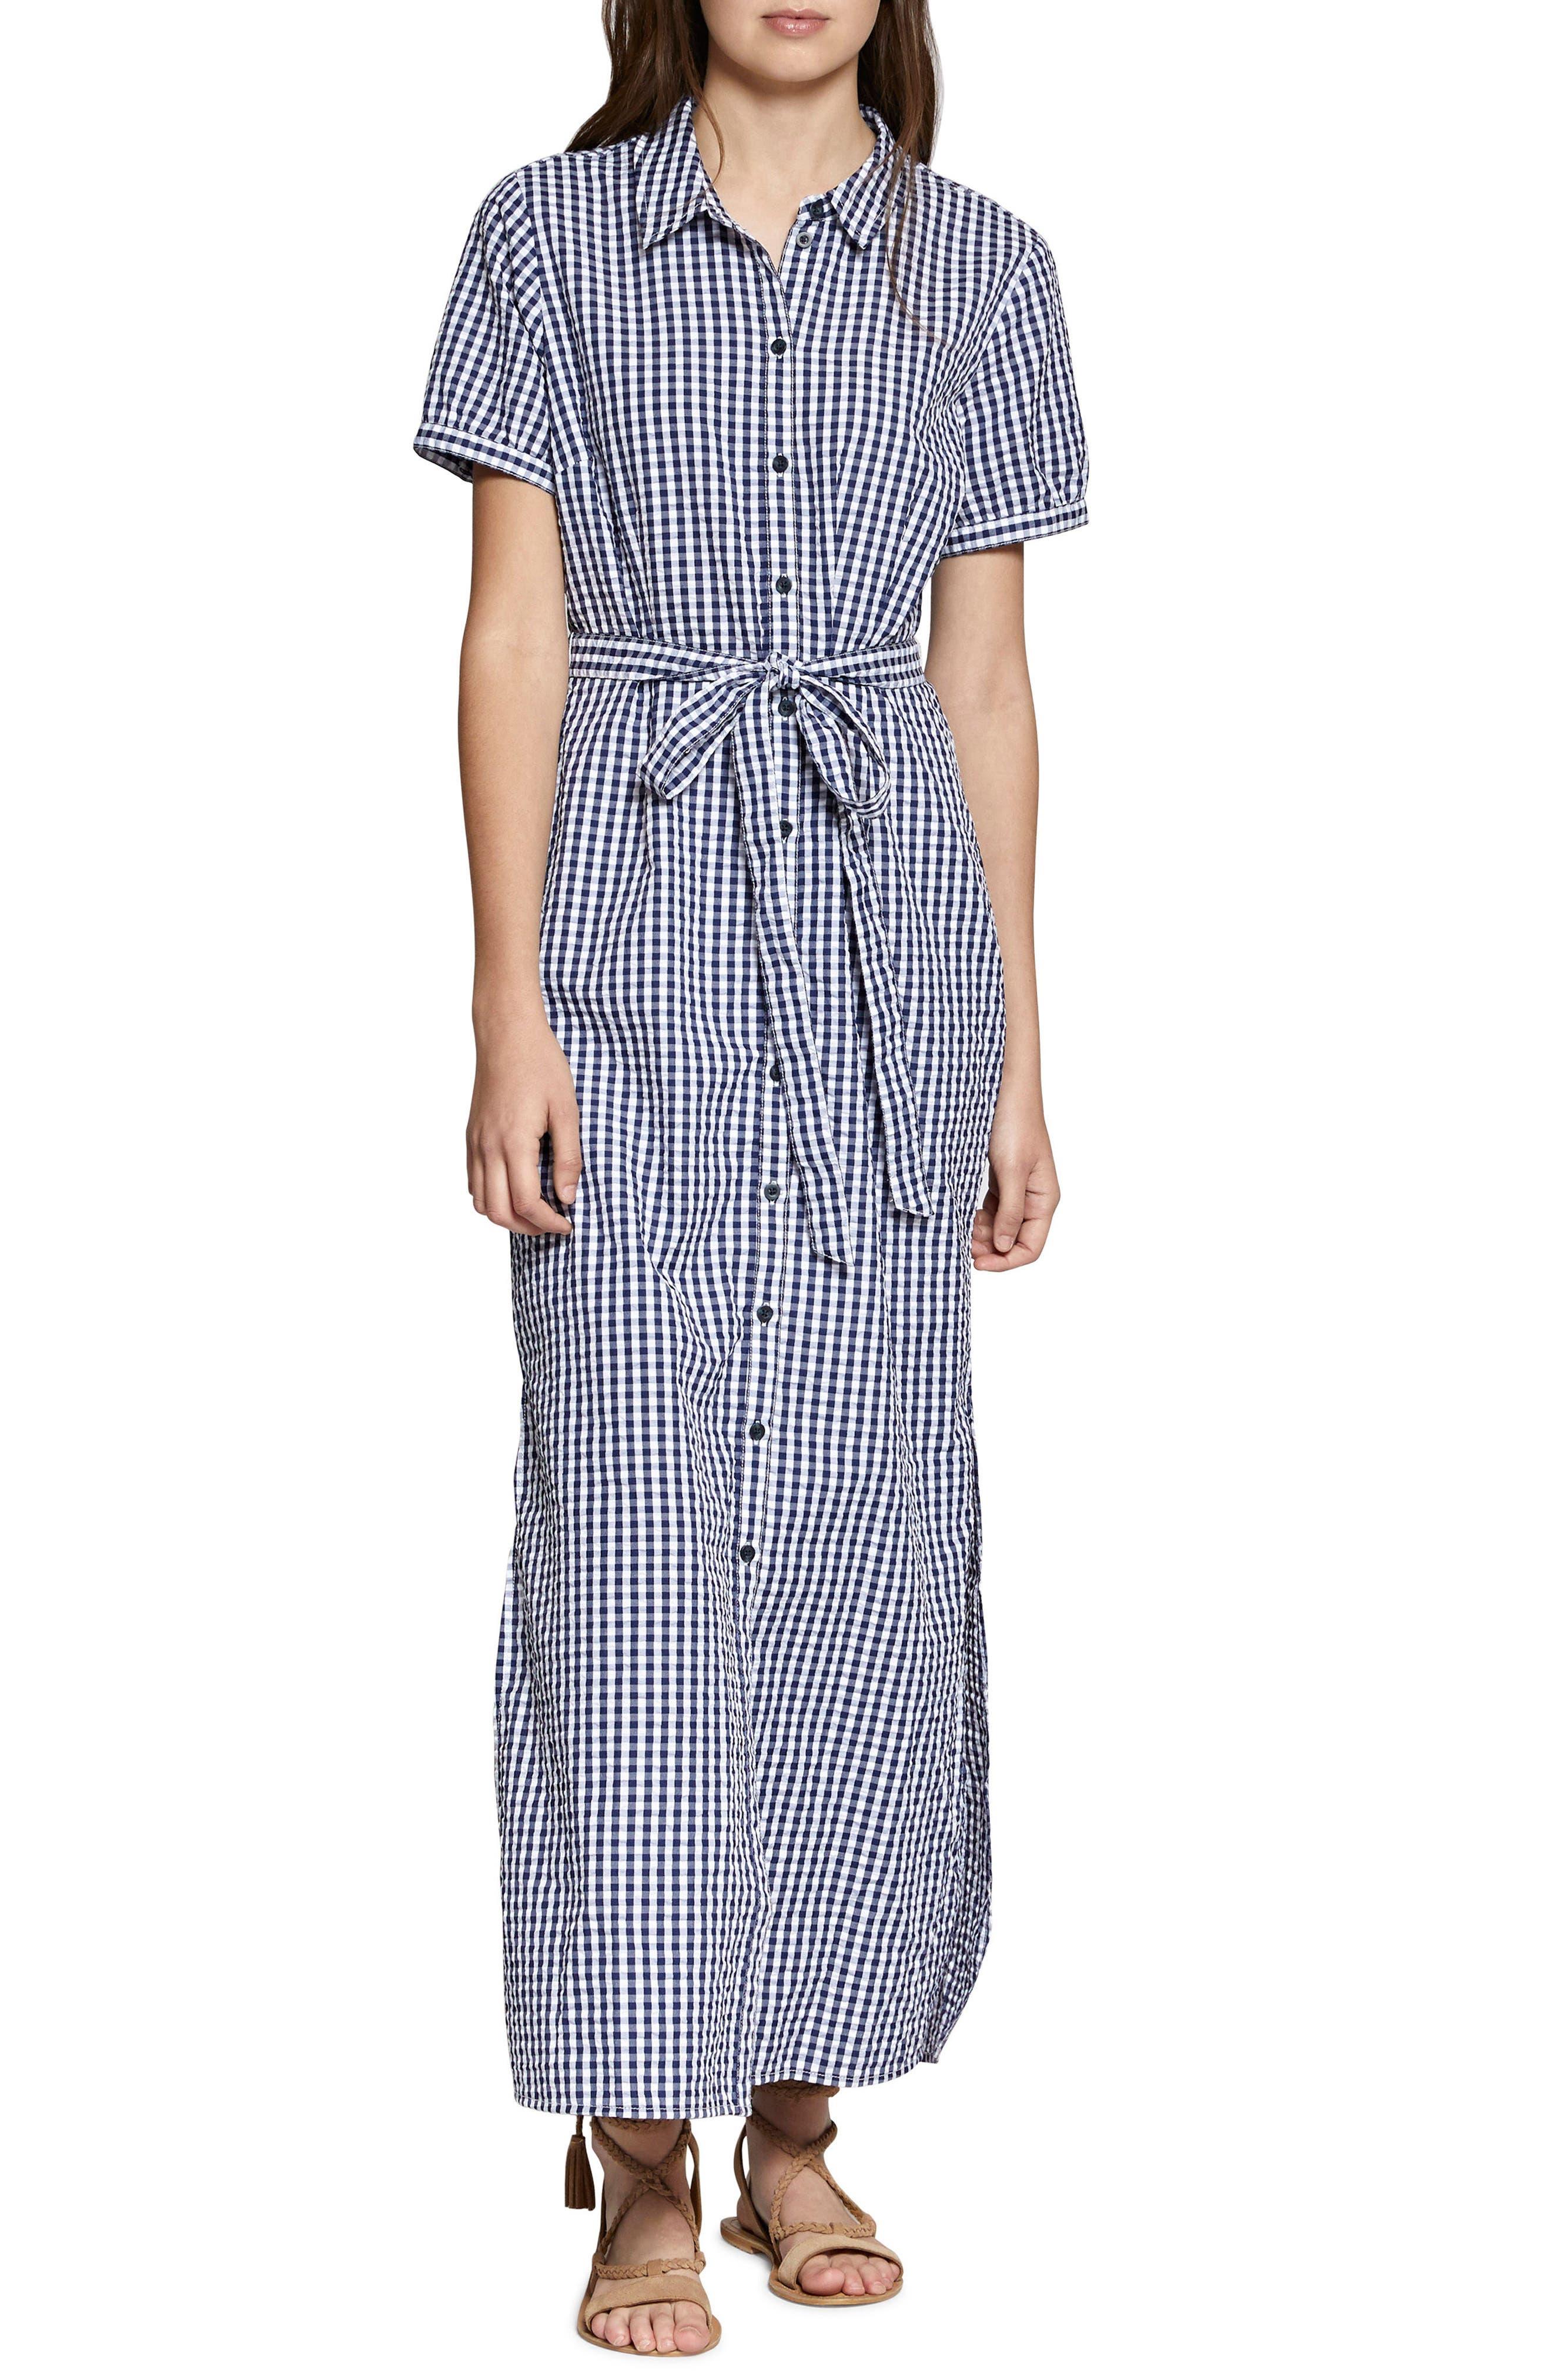 Blue Dawn Maxi Dress,                         Main,                         color, Blue Seersucker